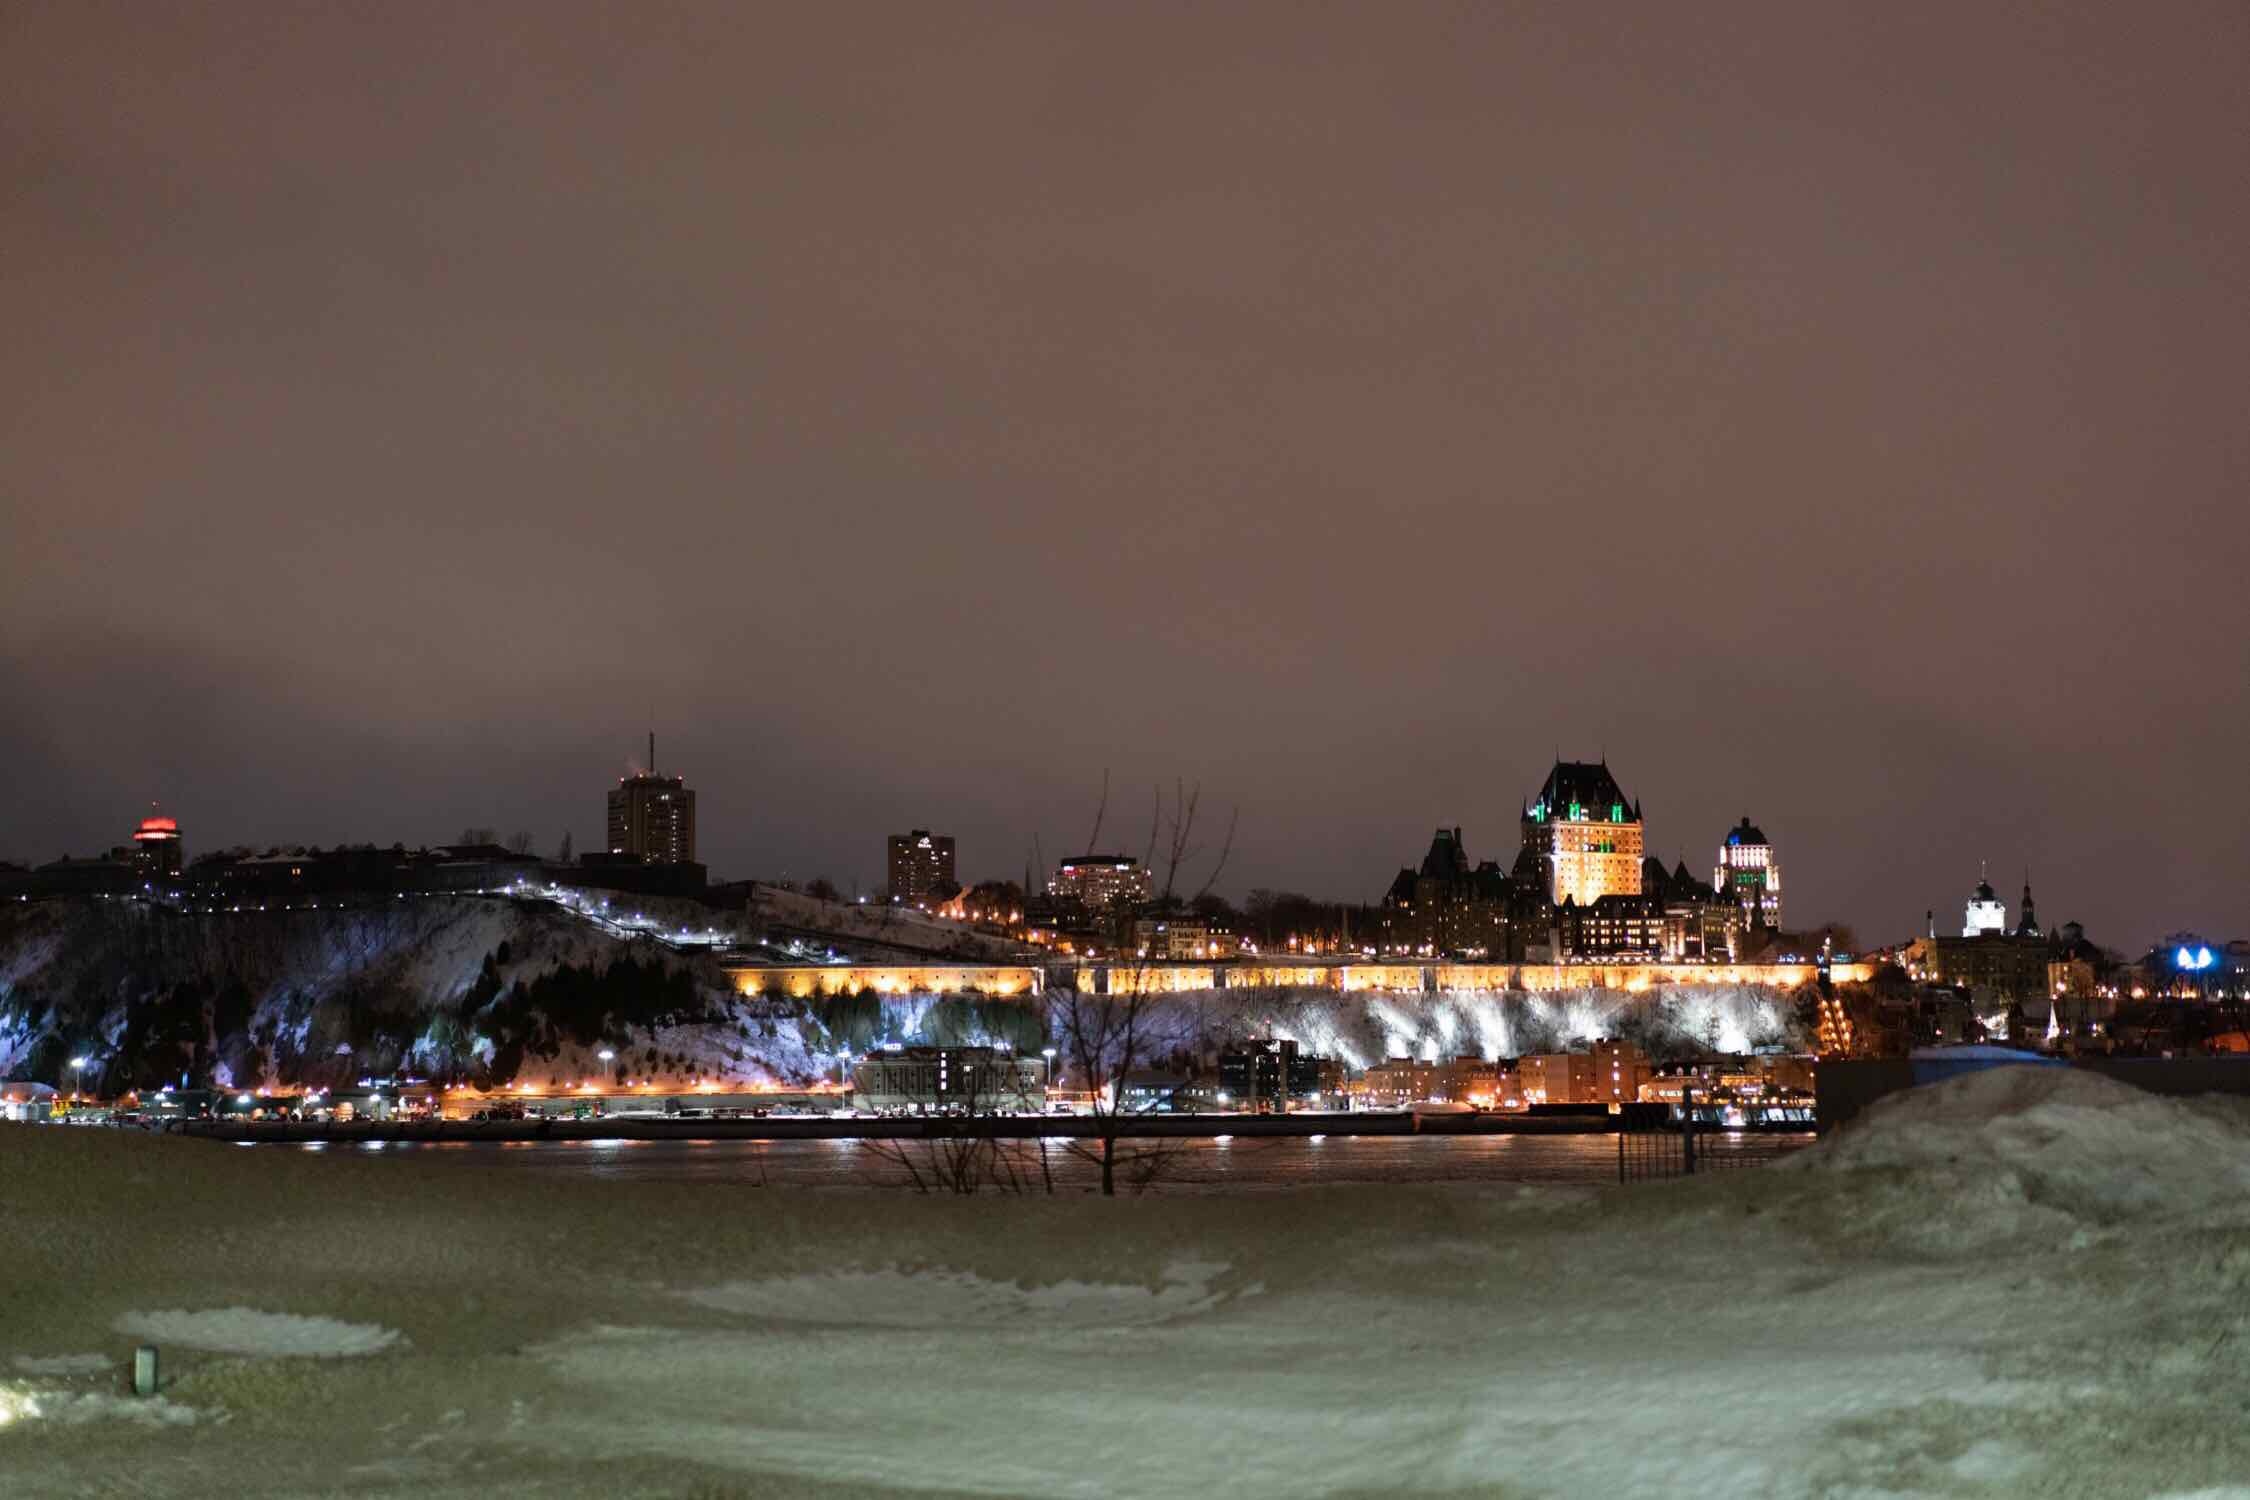 Night view of Old Québec